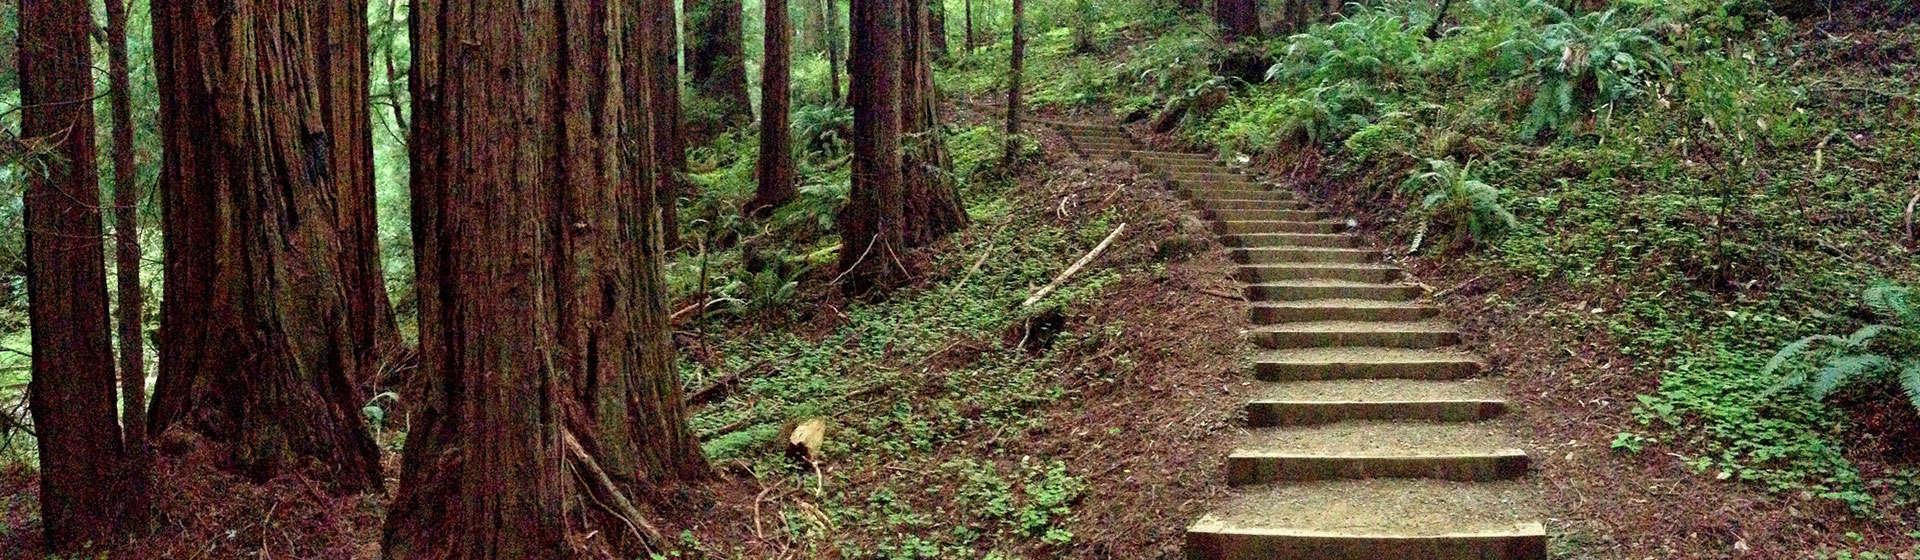 Find a Hiking Trail - HikingGuy com